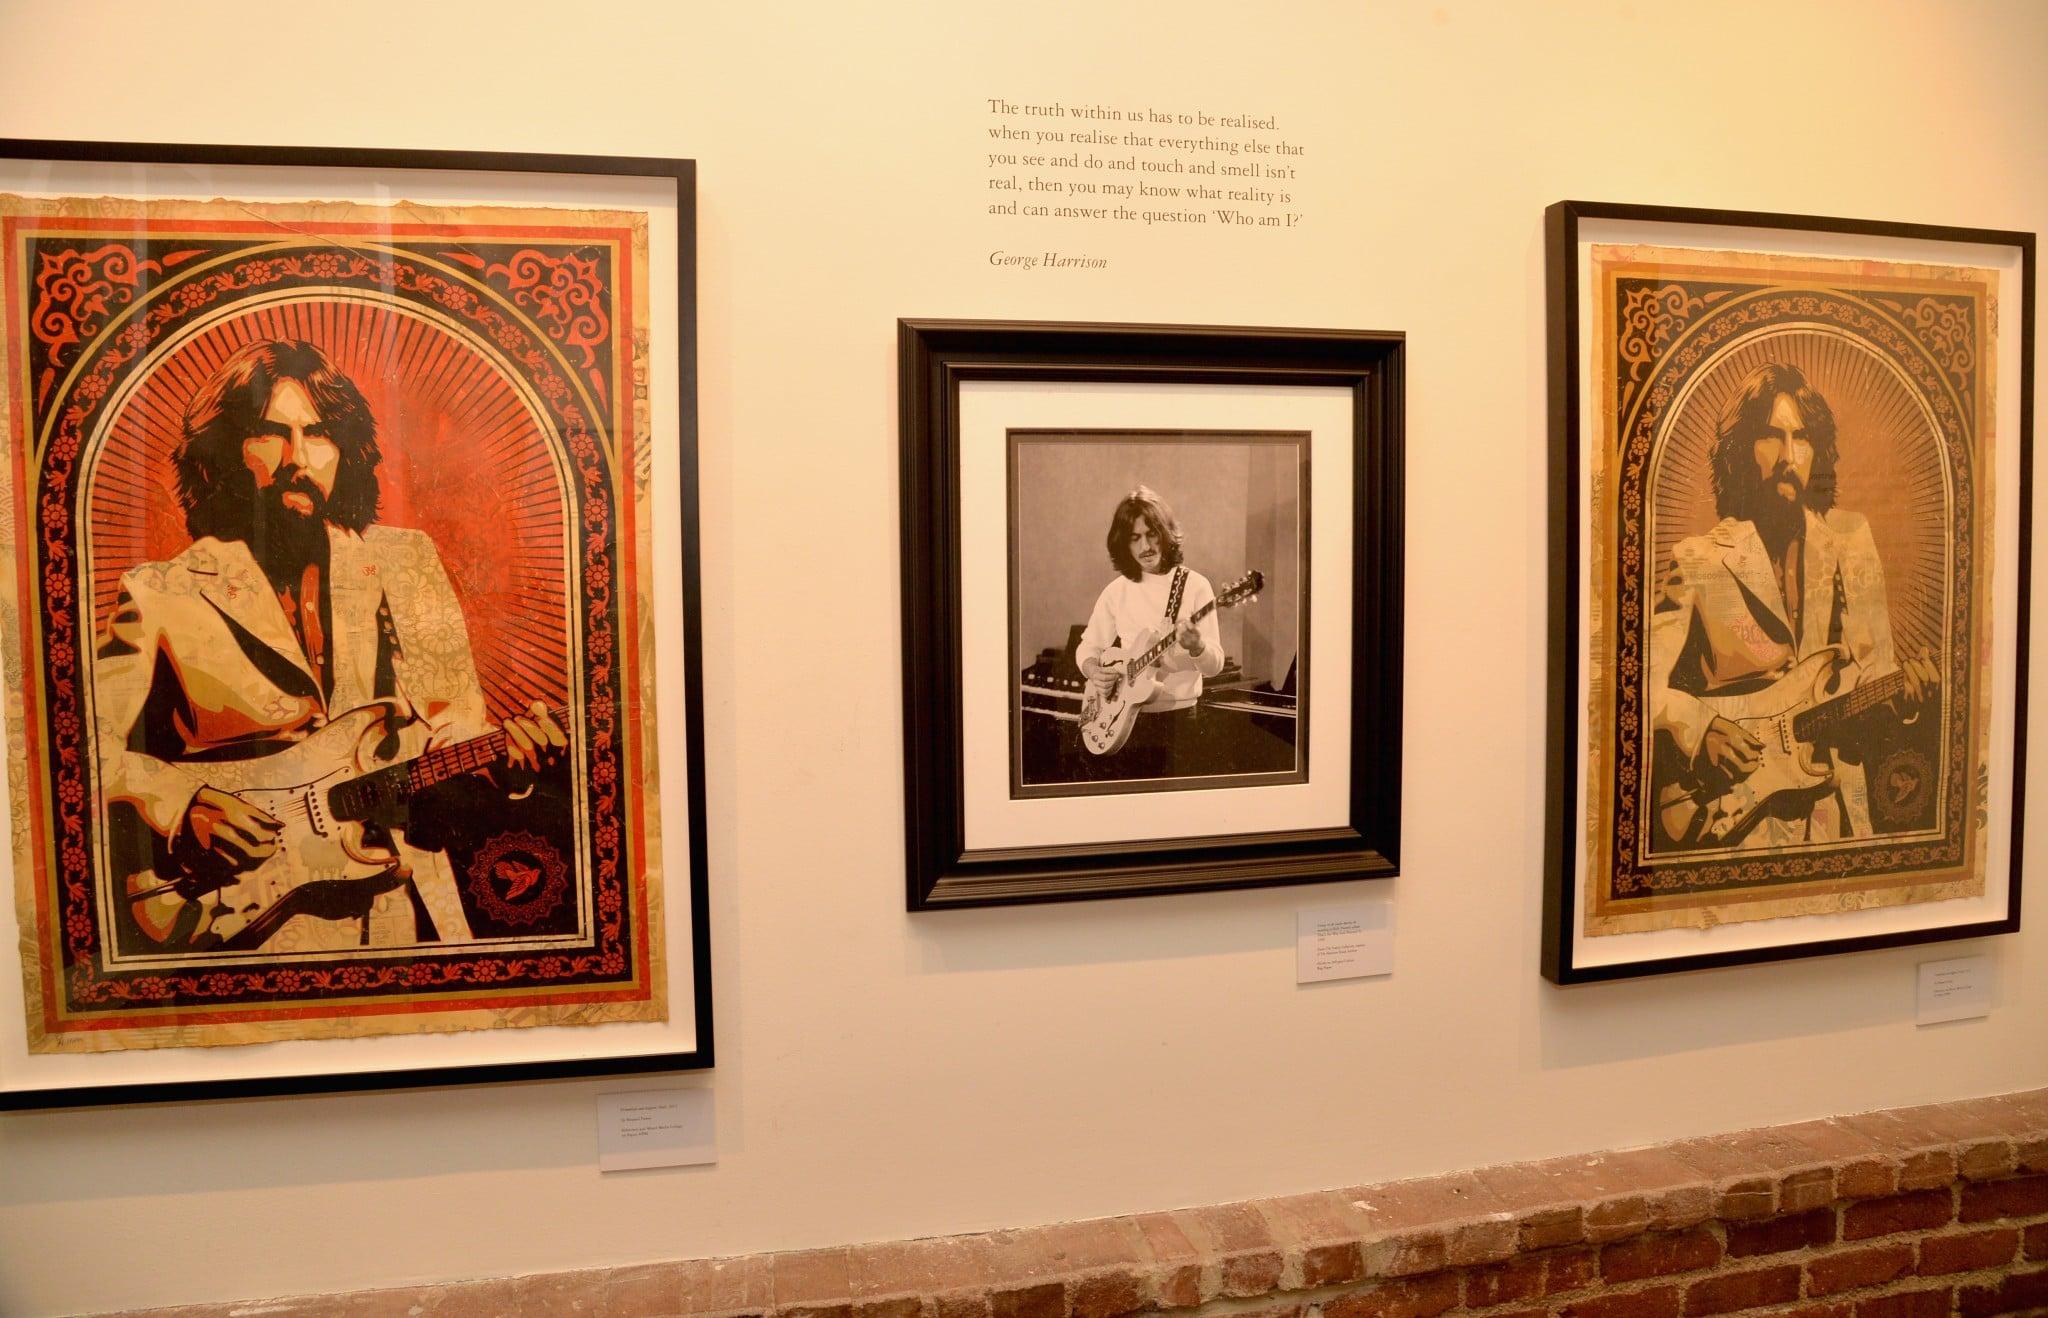 George Harrison Exhibition 2